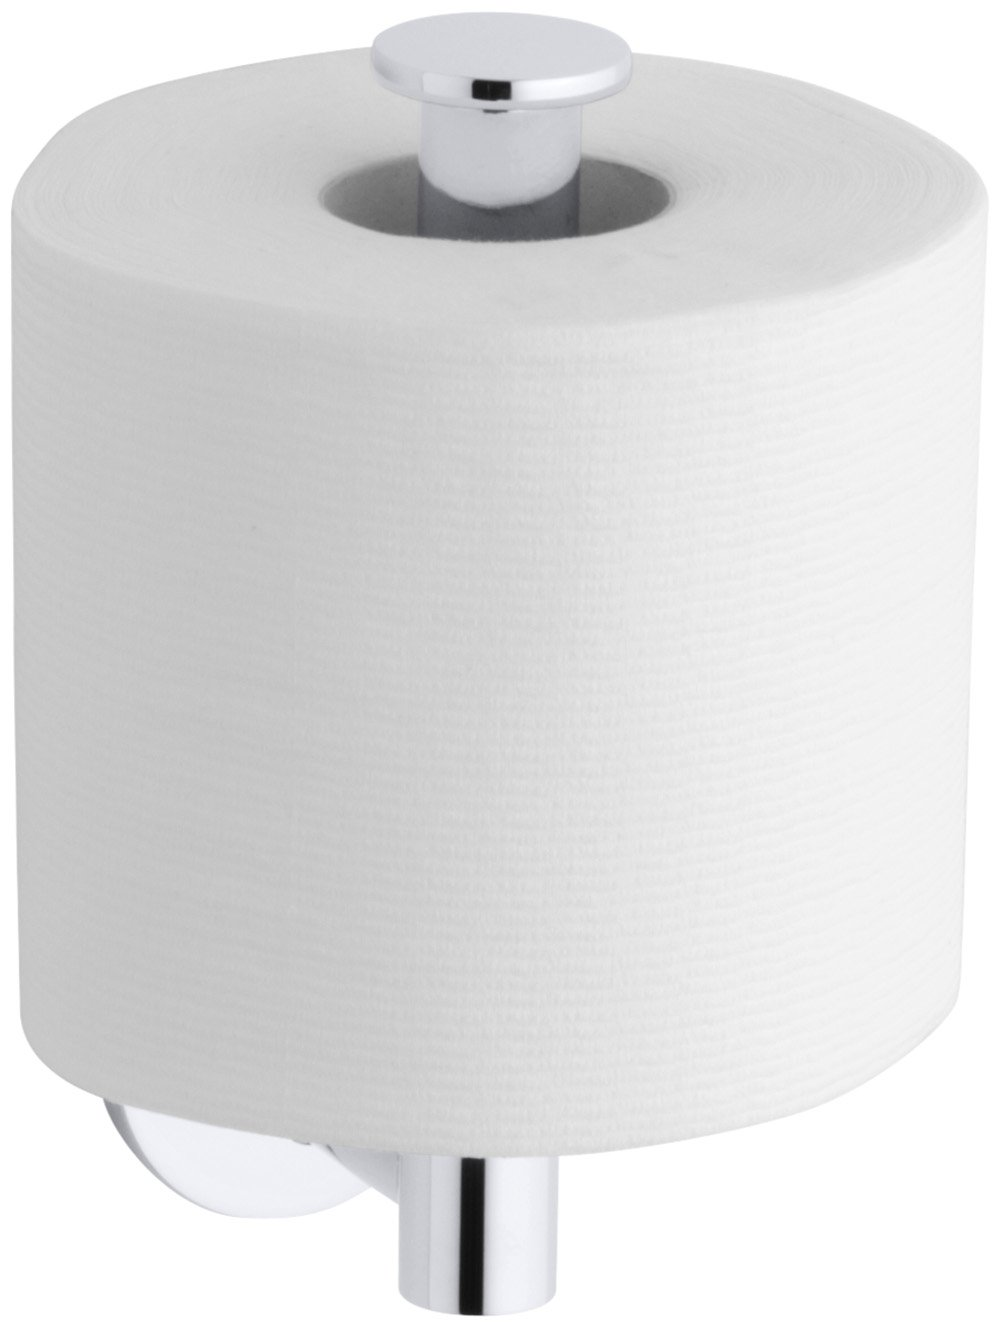 KOHLER K-14459-CP Stillness Vertical Toilet Paper Holder, Polished Chrome